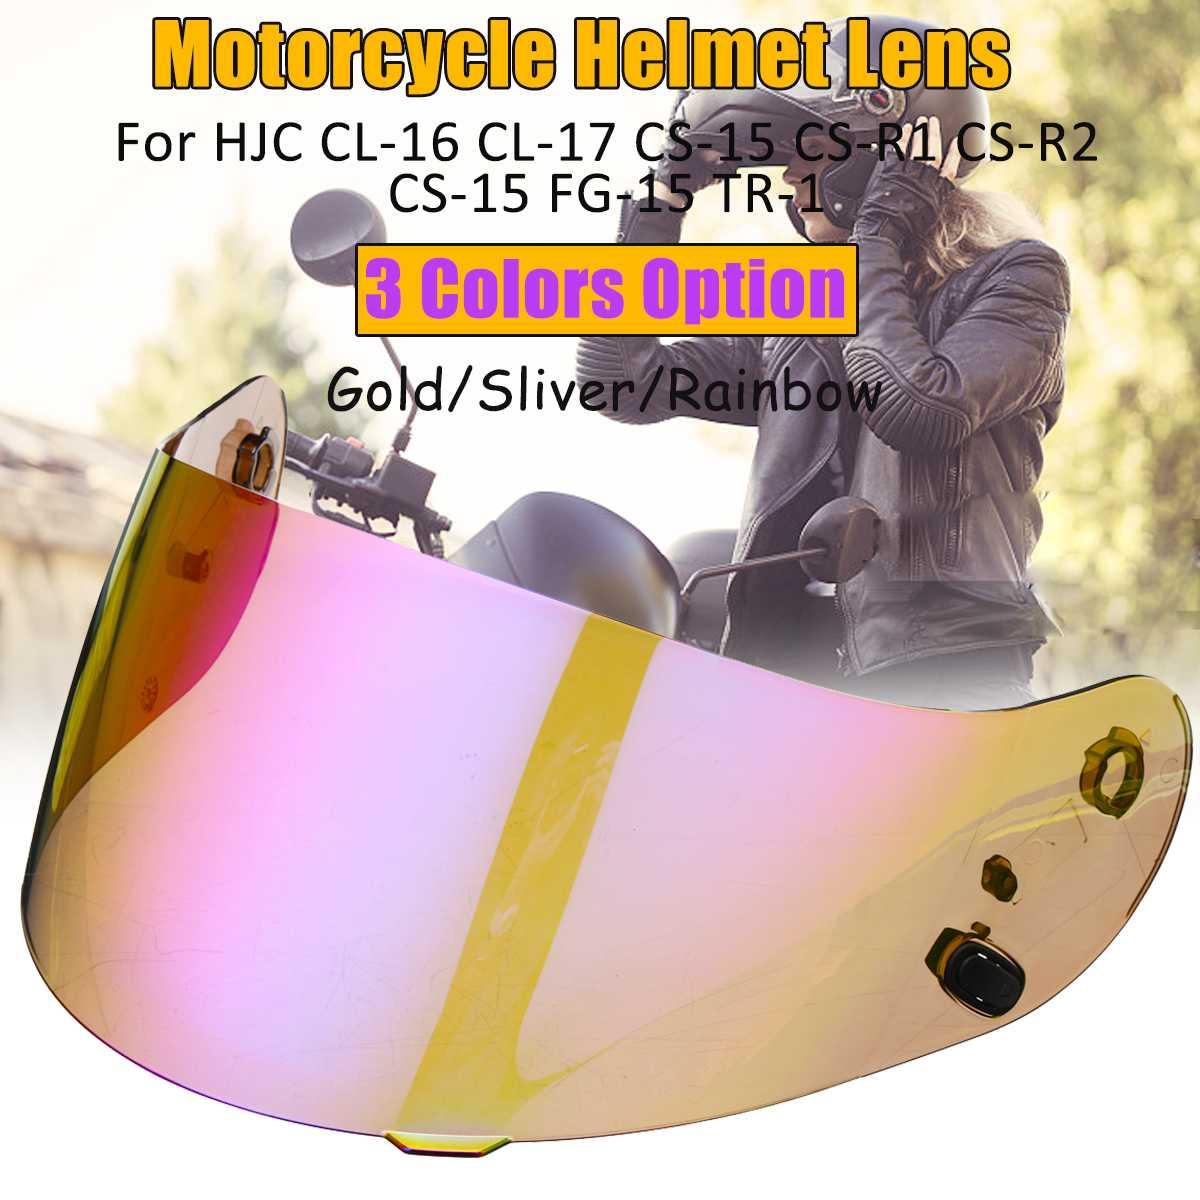 Back To Search Resultsautomobiles & Motorcycles Motorcycle Helmet Visor For Hjc Cl-16 Cl-17 Cs-15 Cs-r1 Cs-r2 Cs-15 Fg-15 Tr-1 Shield Parts Original Glasses Motorbike Lens